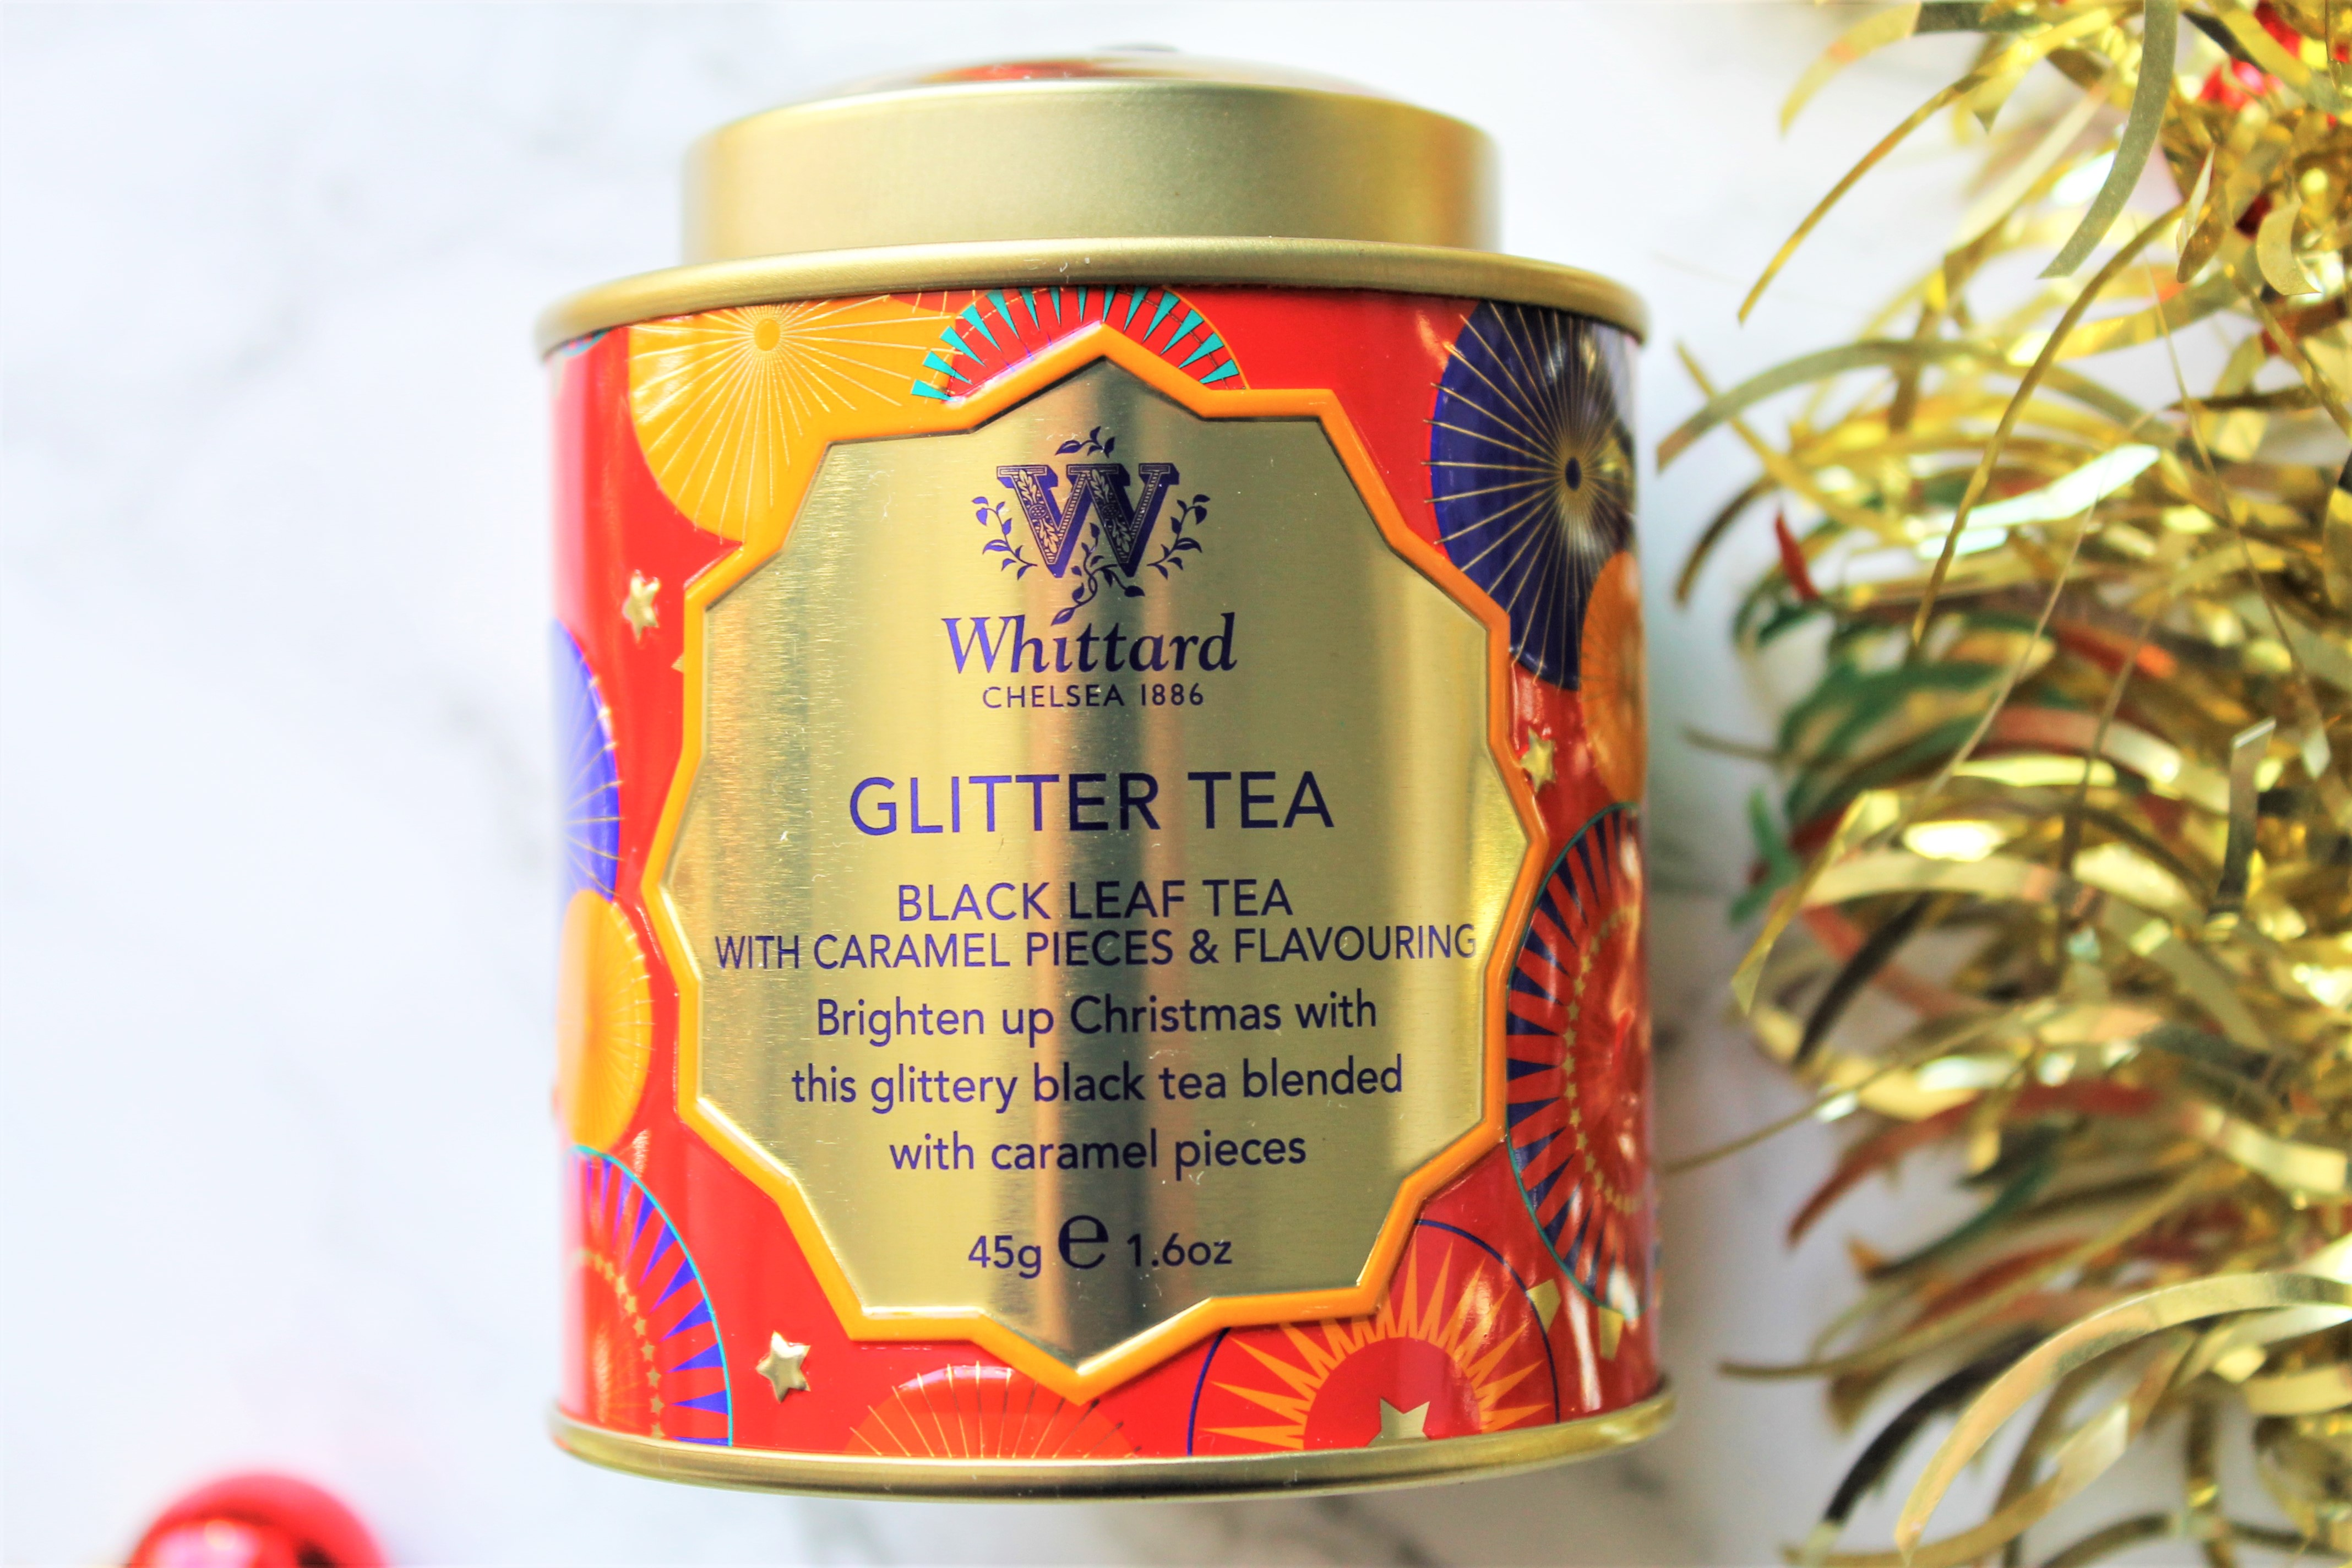 glitter tea whittard mini caddy